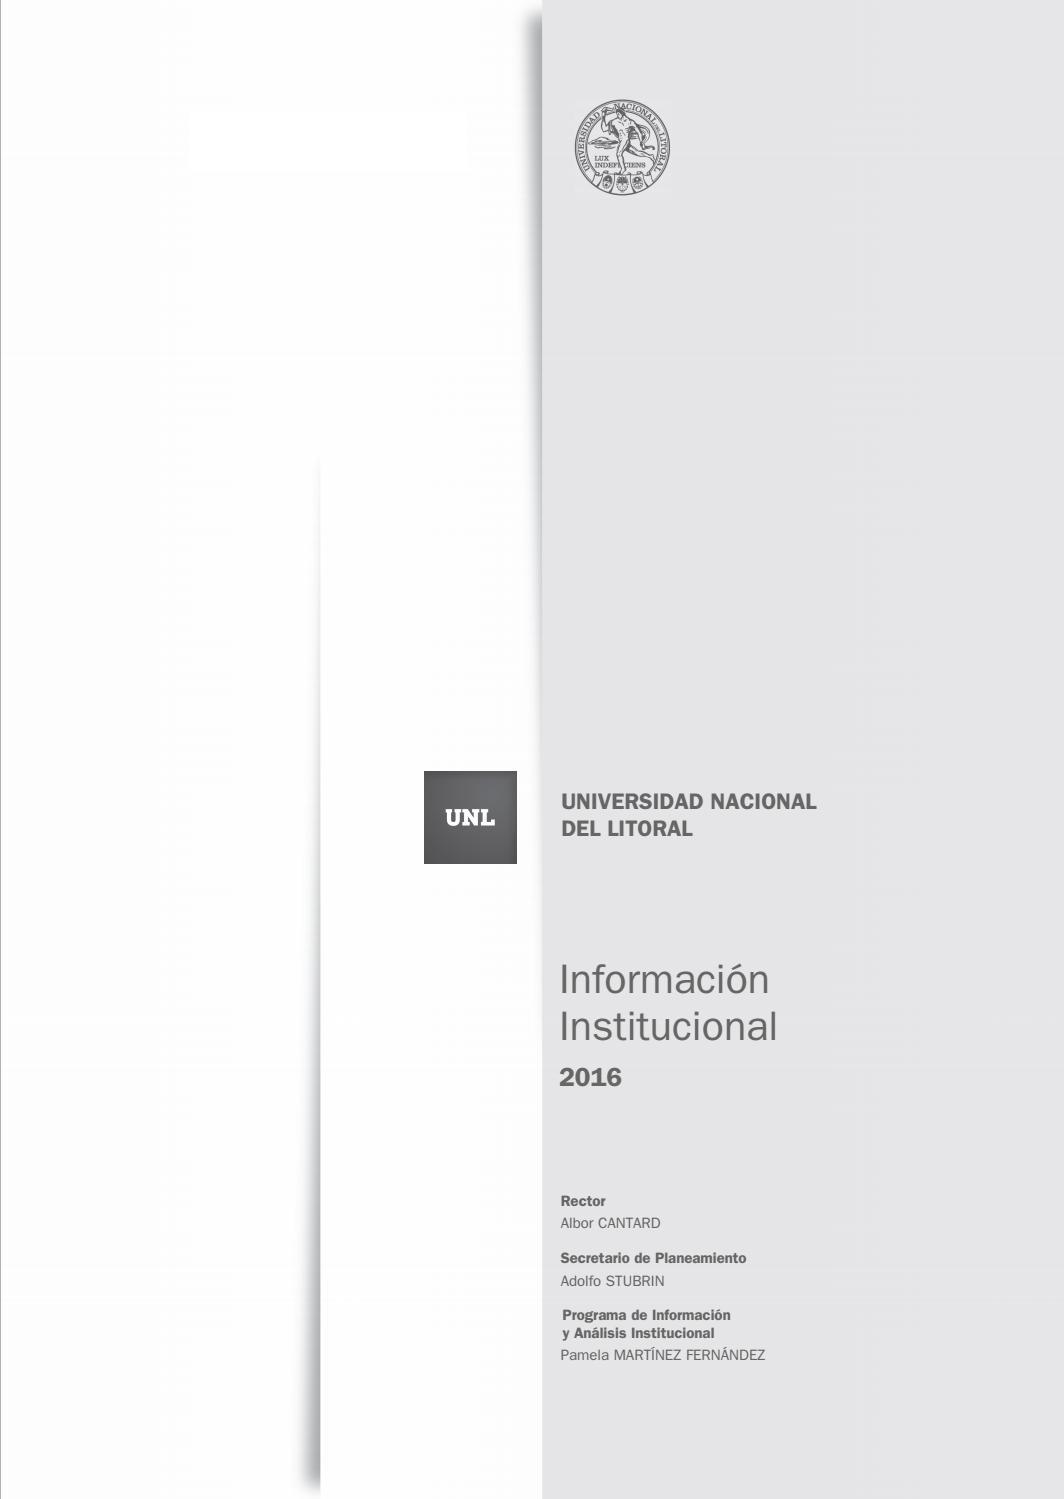 Informe Institucional 2016 by Universidad Nacional del Litoral - issuu